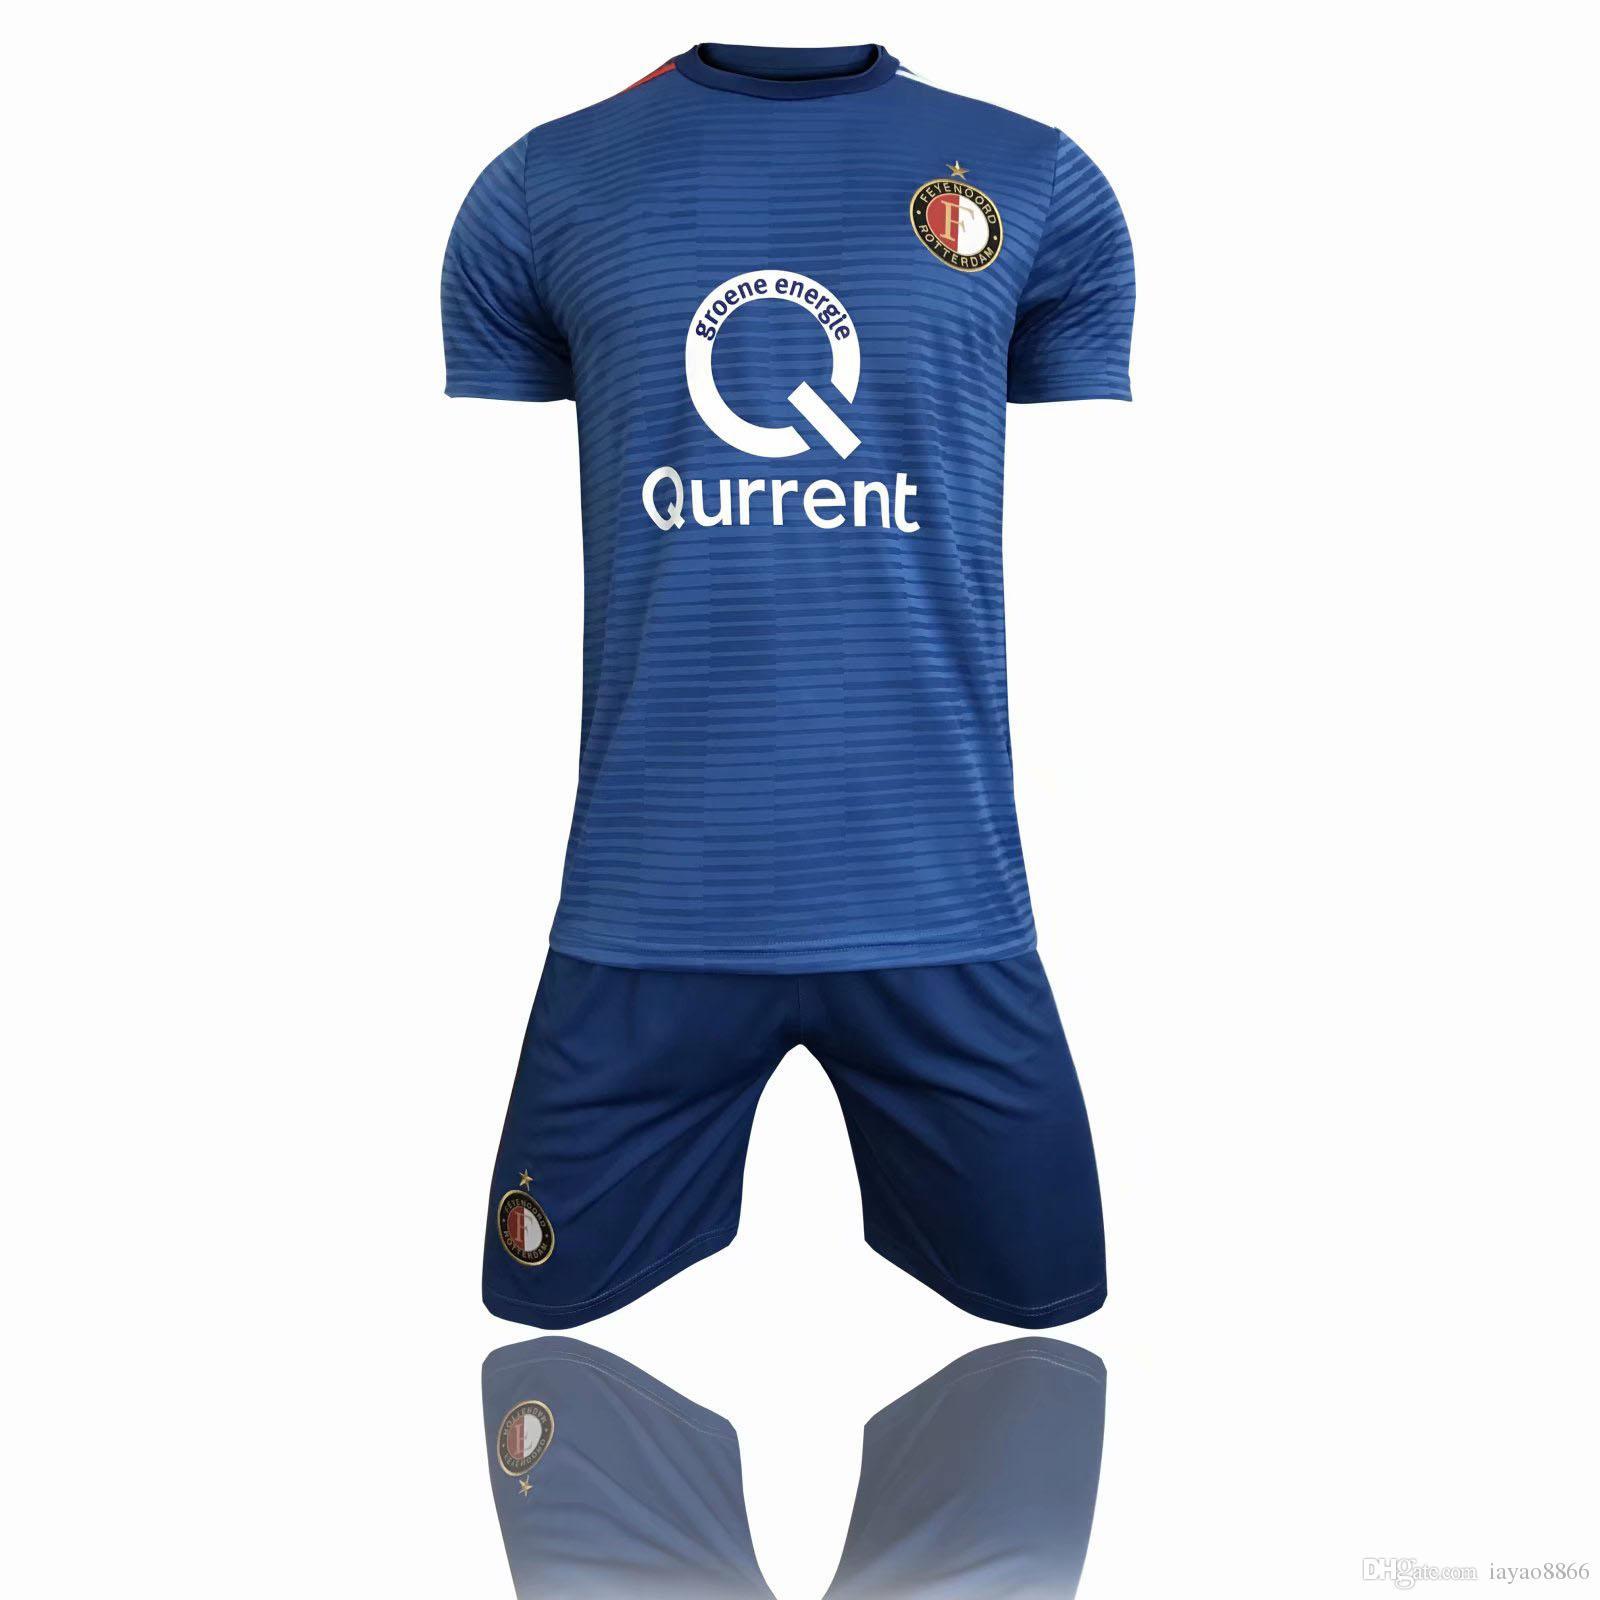 2019 2018 19 Feyenoord Home Away Thai Quality Soccer Jerseys Shirts Set 11  LARSSON 32 V.PERSIE 19 BERGHUIS 10 VILHENA 9 JORGENSEN Football Shirt From  ... 3c1a1dd31